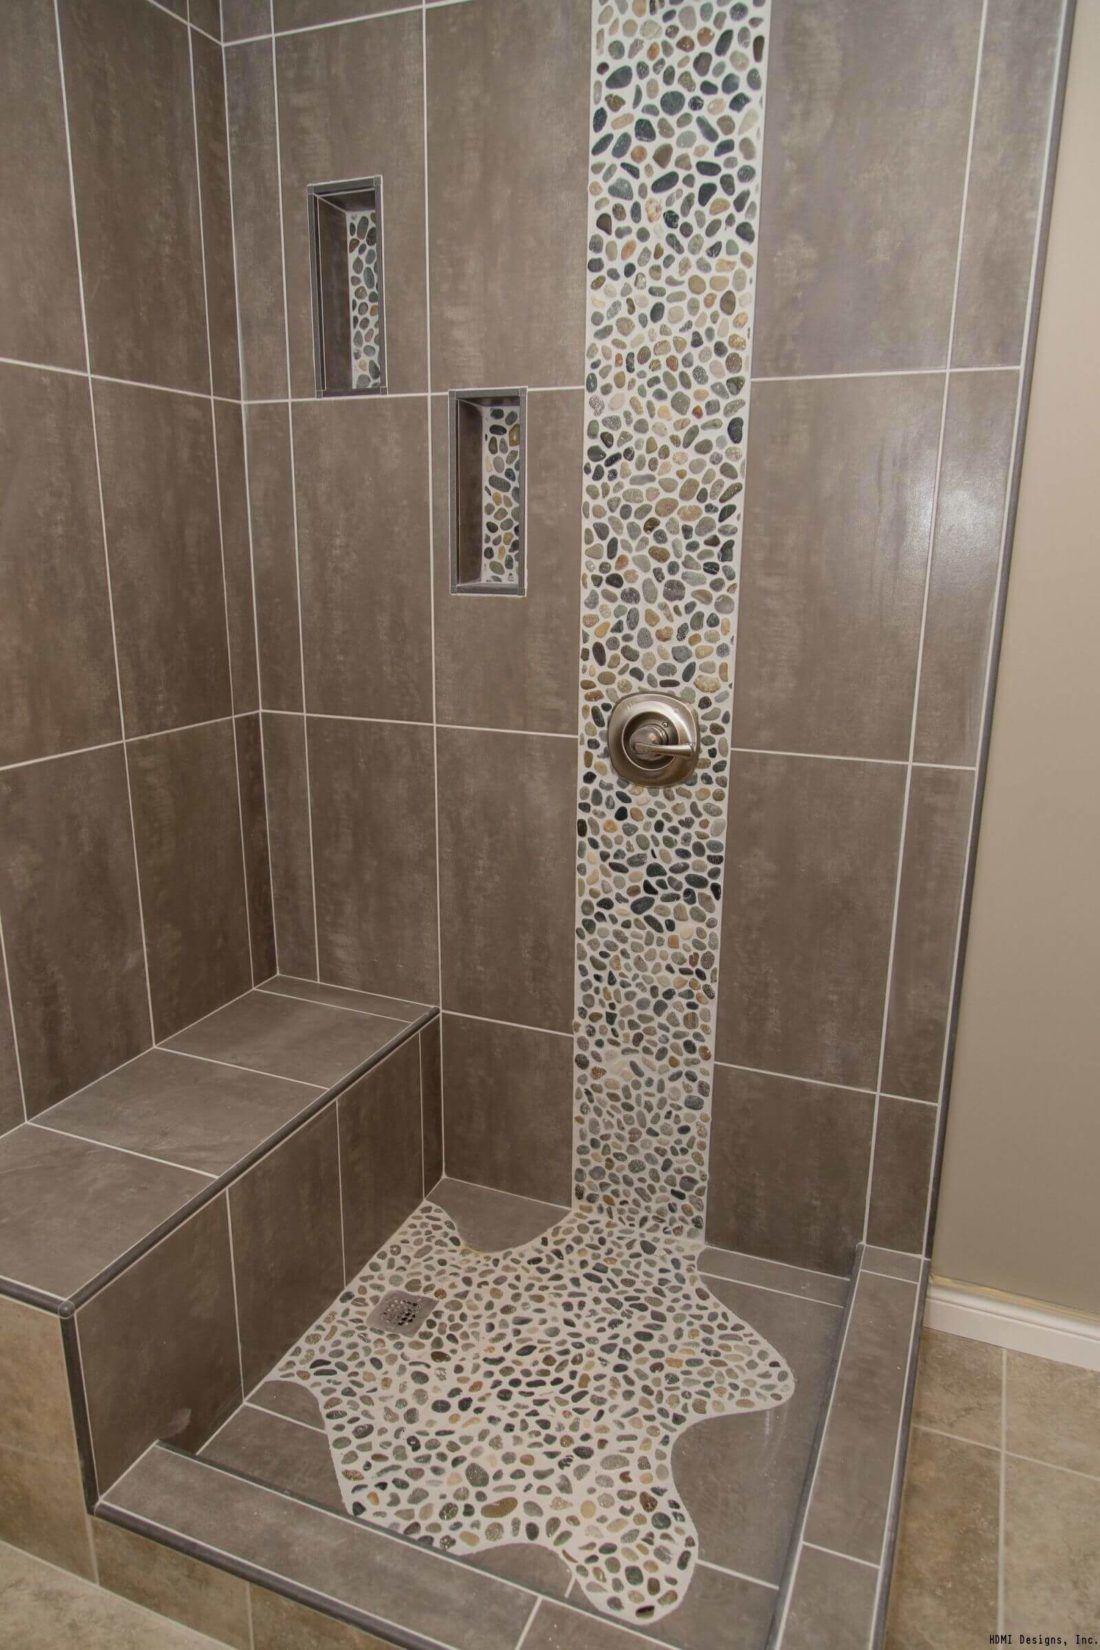 31 Stunning Shower Tile Ideas For Your Bathroom Farmfoodfamily Shower Remodel Shower Tile Bathrooms Remodel